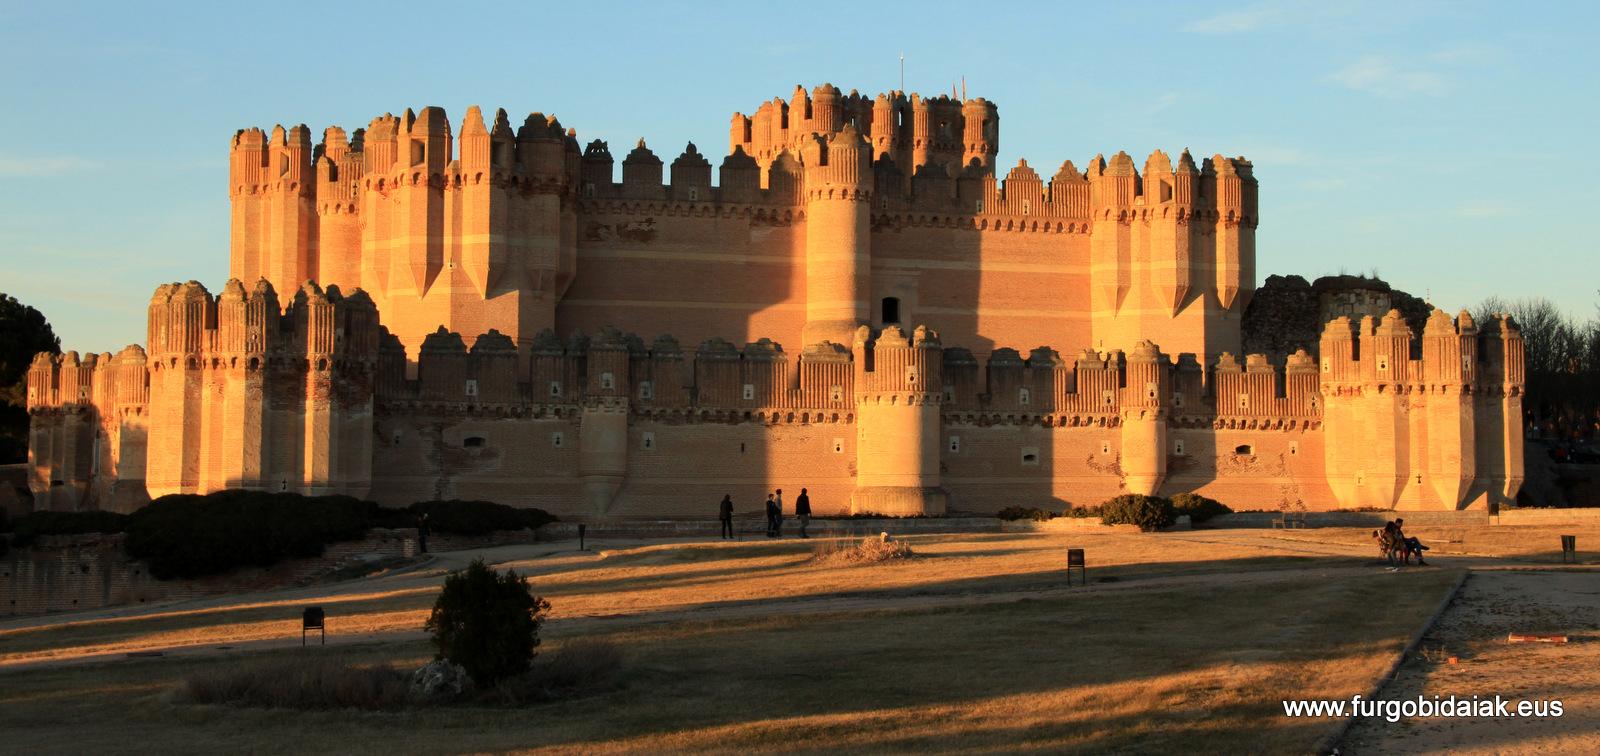 Castillo mudejar Coca Segovia